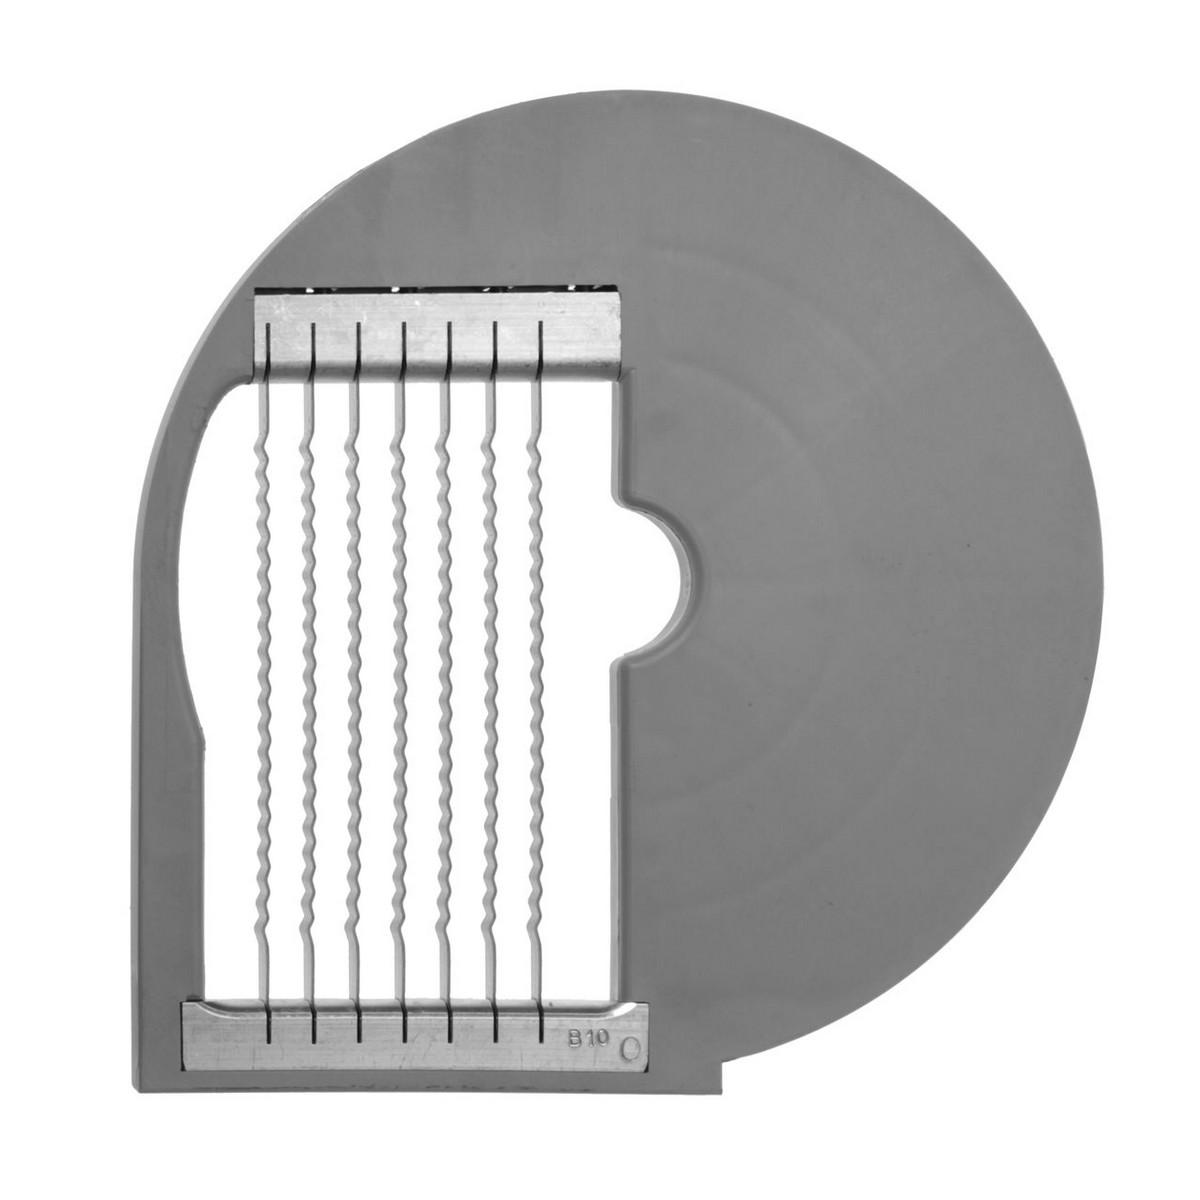 B10o Serie AK Disc - Für alle CHEF 300-400-Modelle